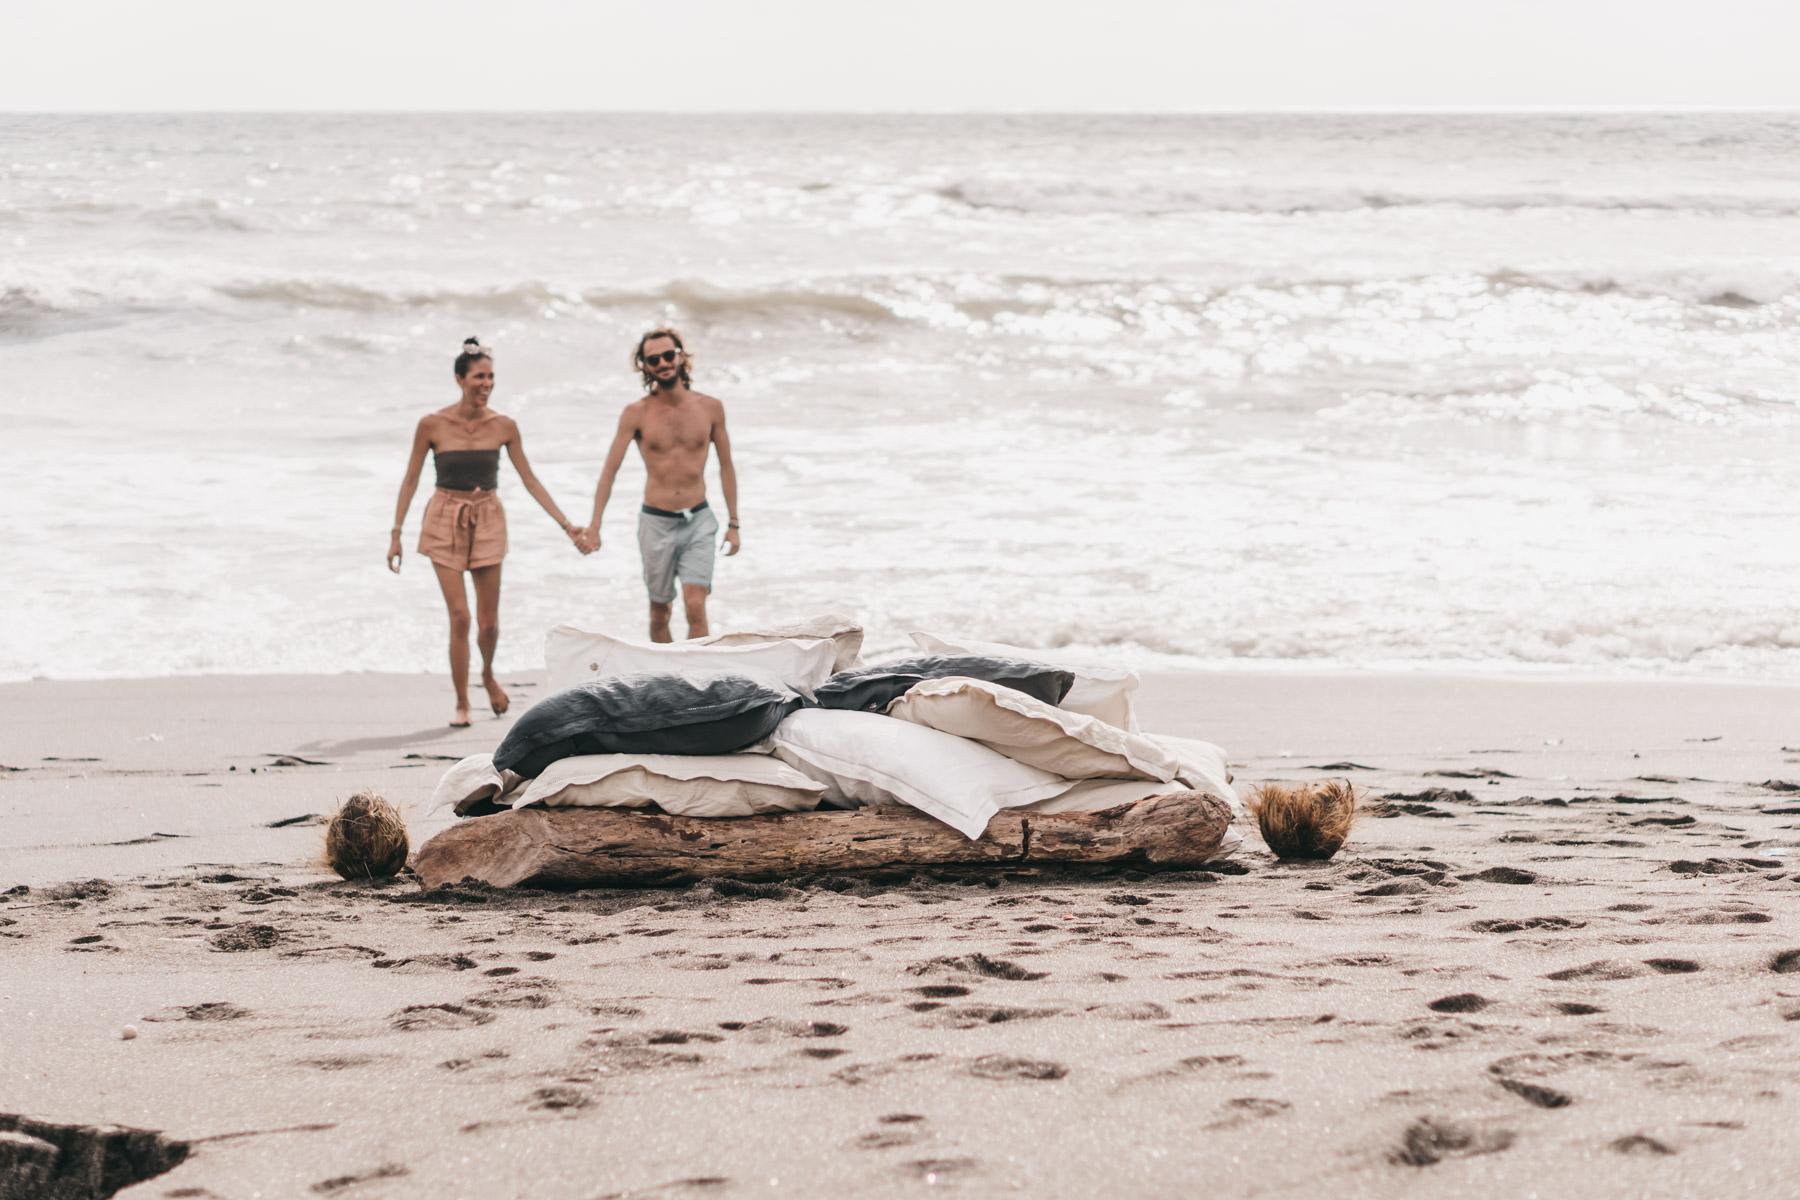 Keira-Mason-in-between-the-sheets-romantic-beach-walk.jpg